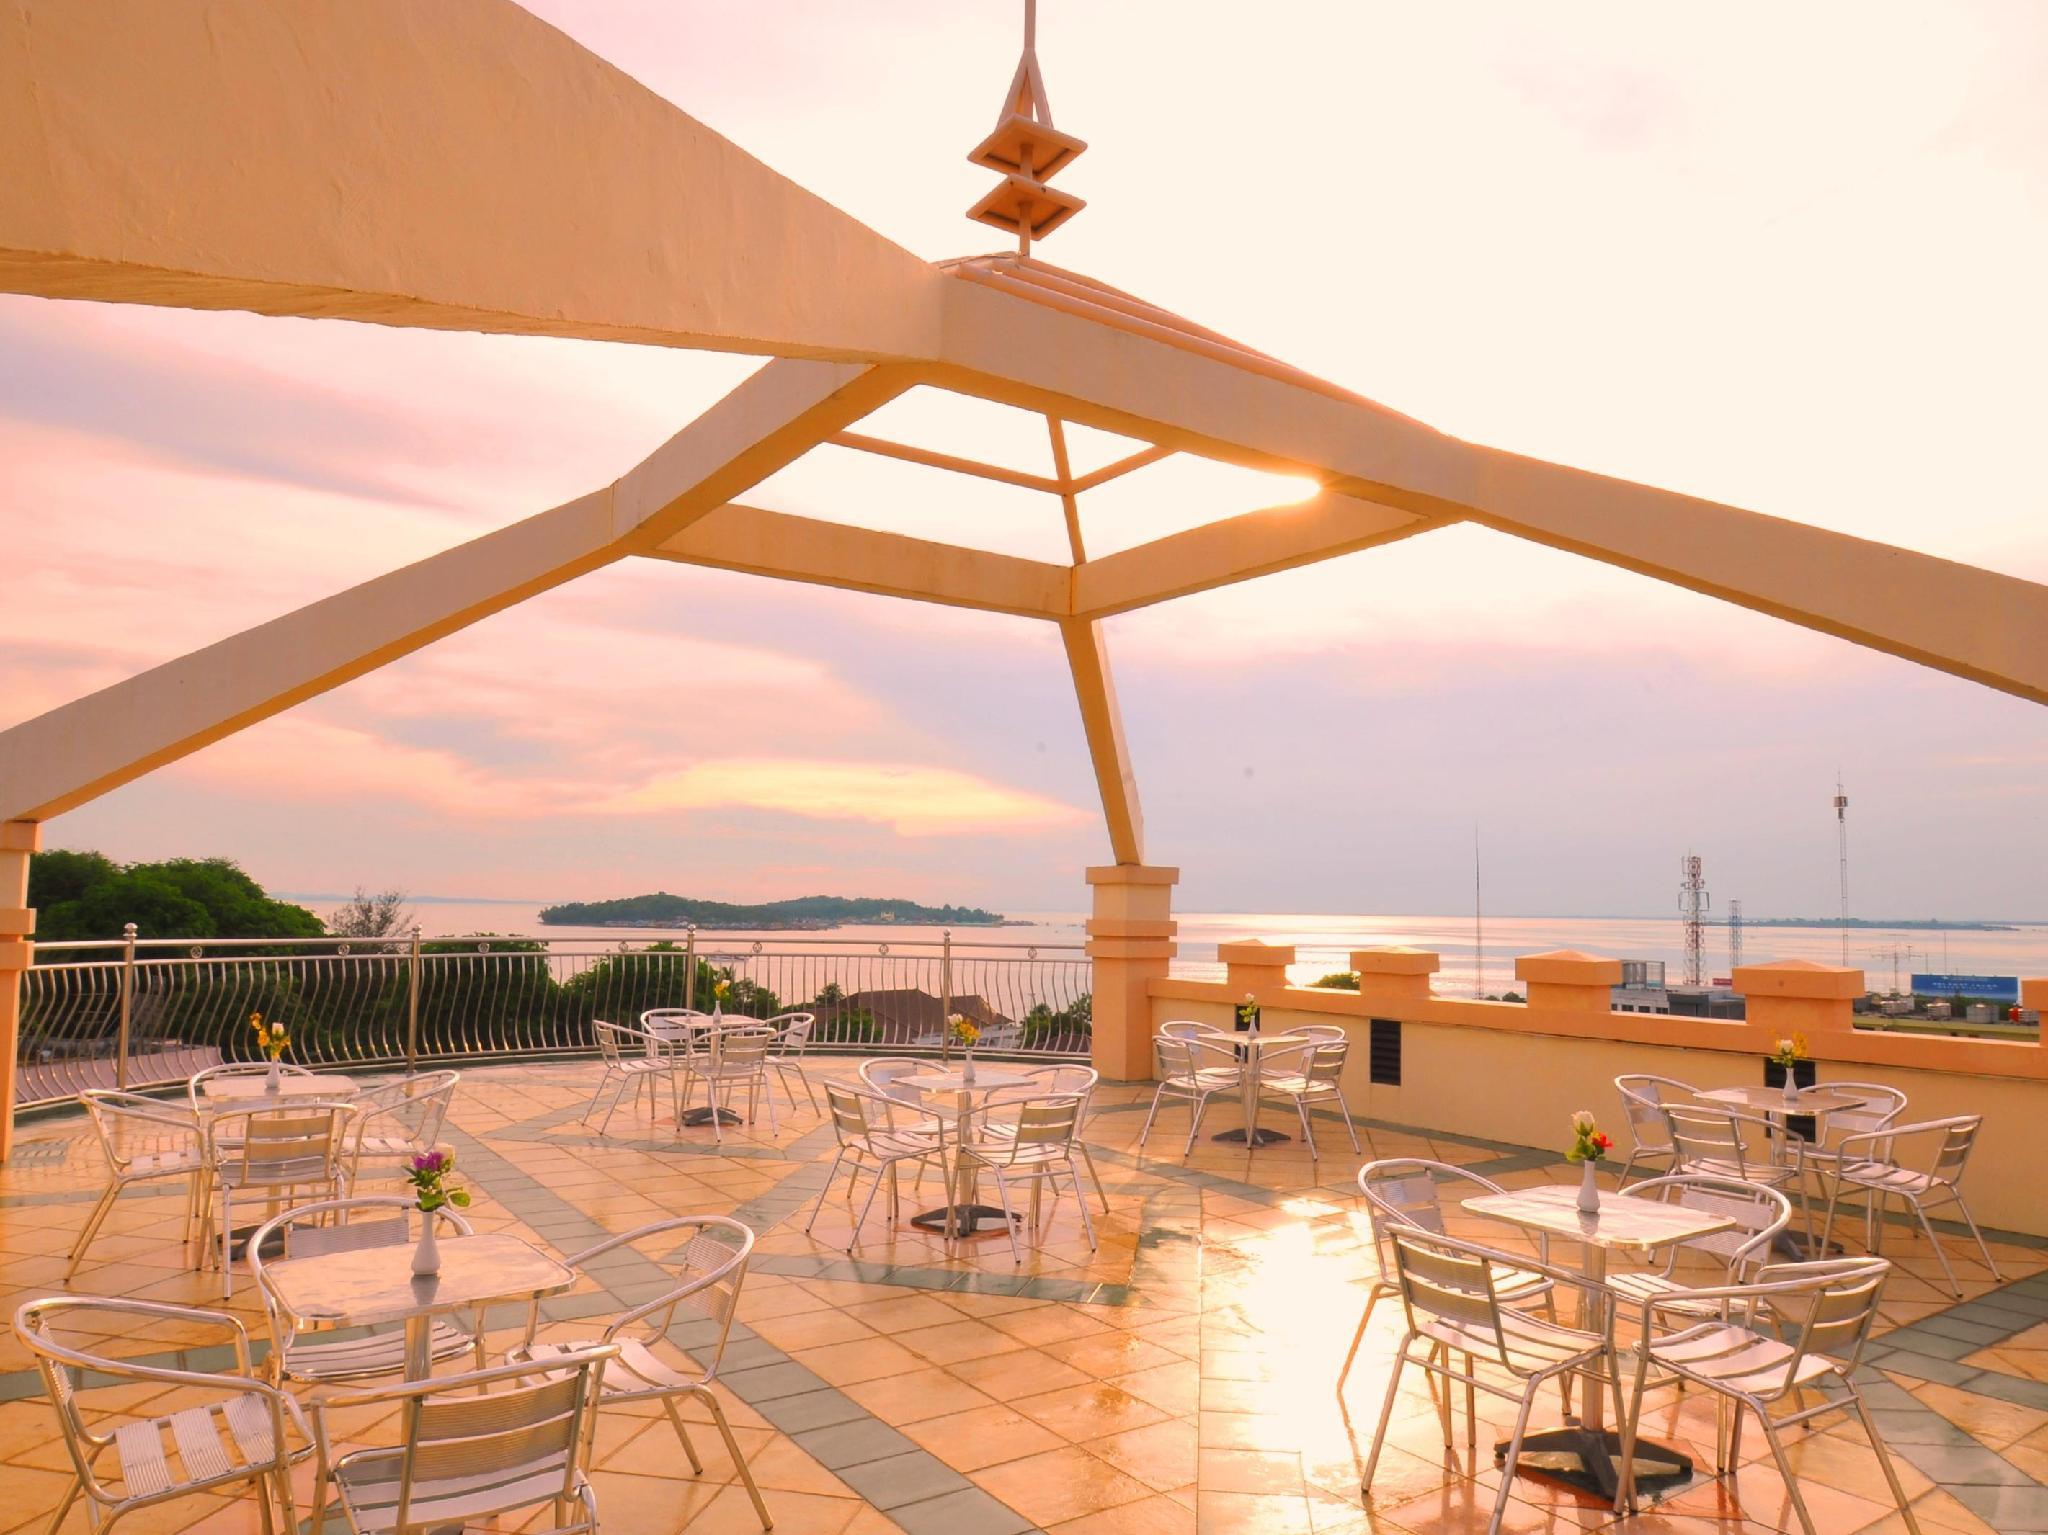 Hotel Laguna, Tanjung Pinang